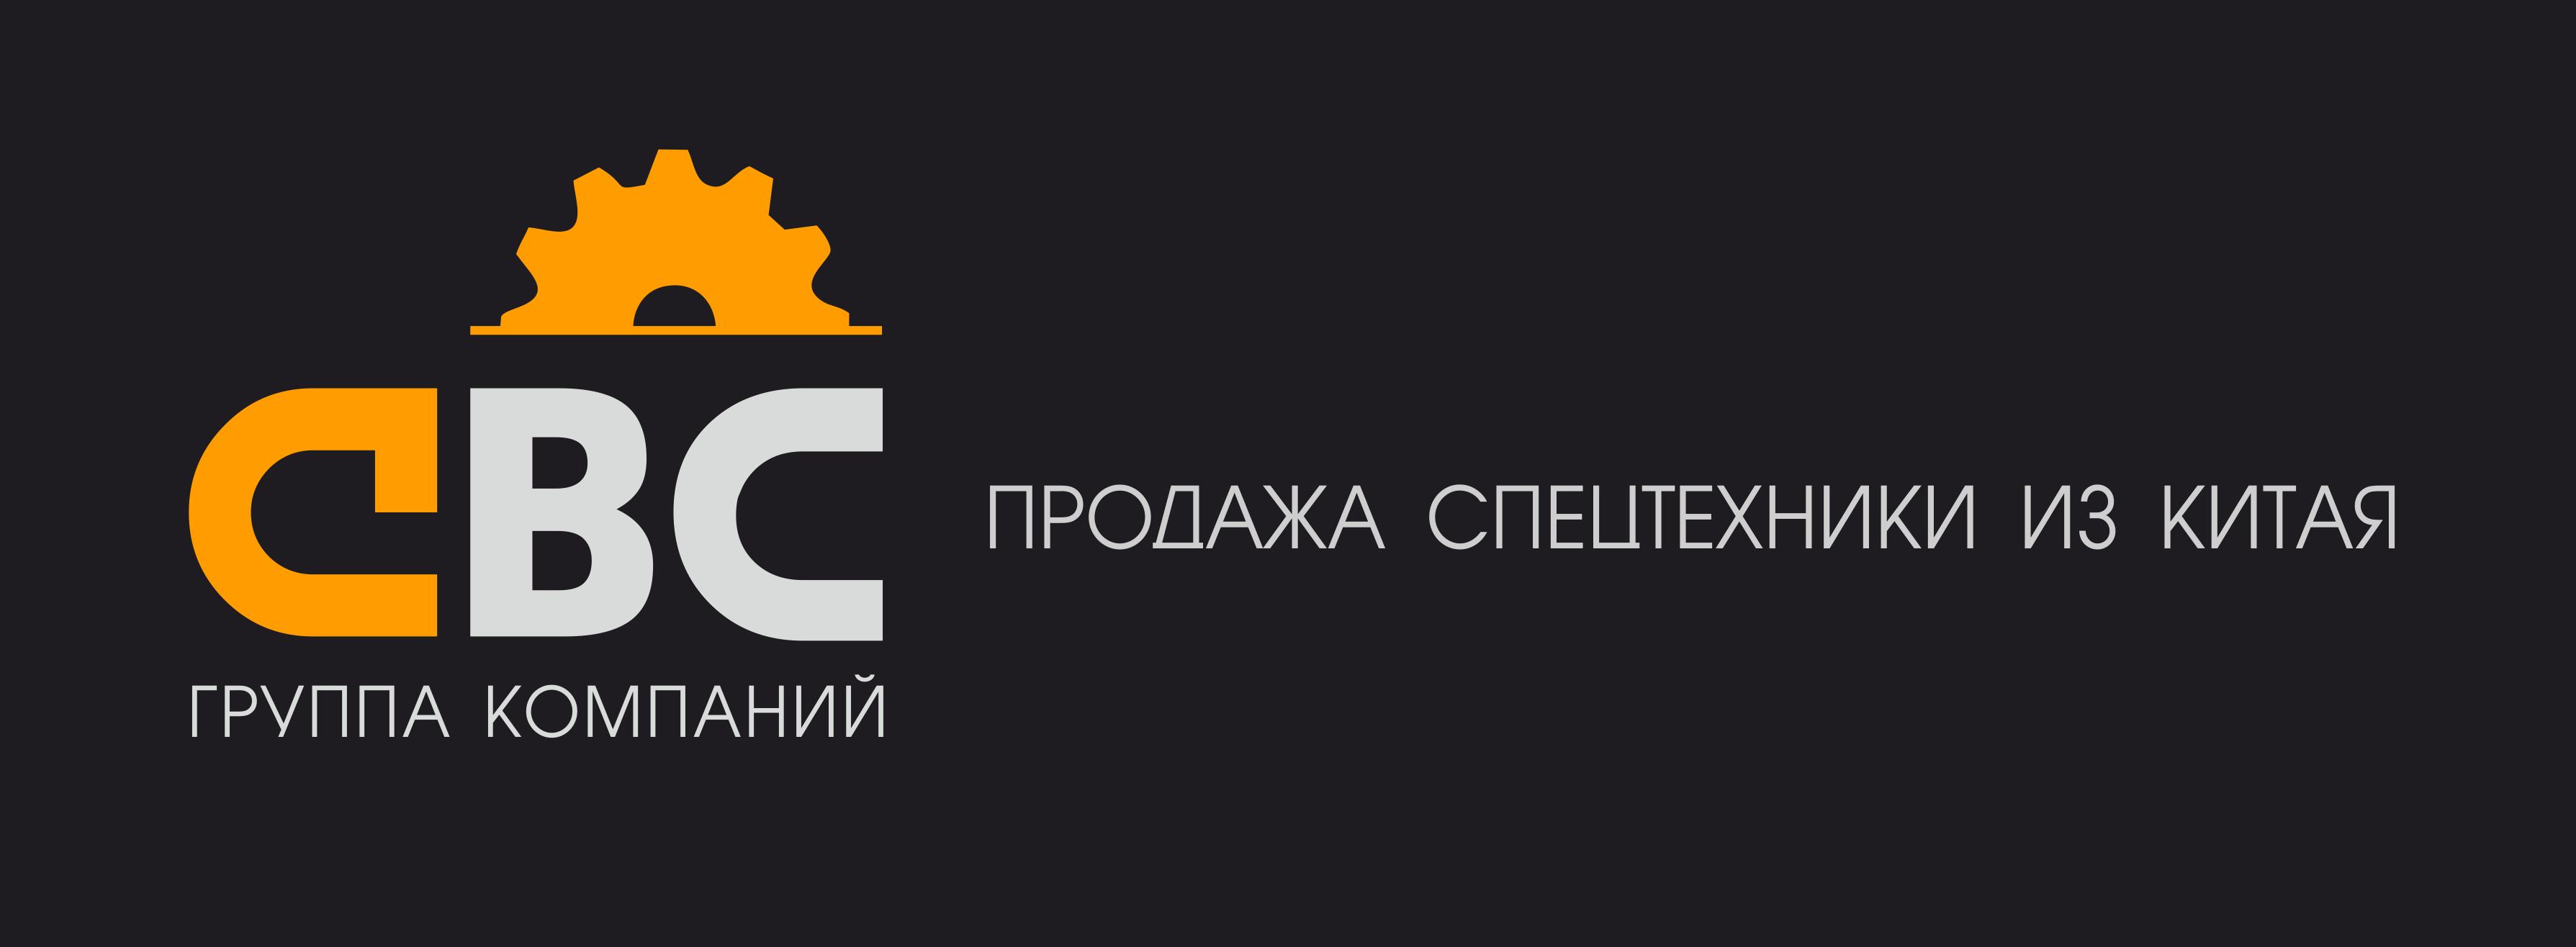 Логотип +  слоган фото f_794545911f5ce747.png